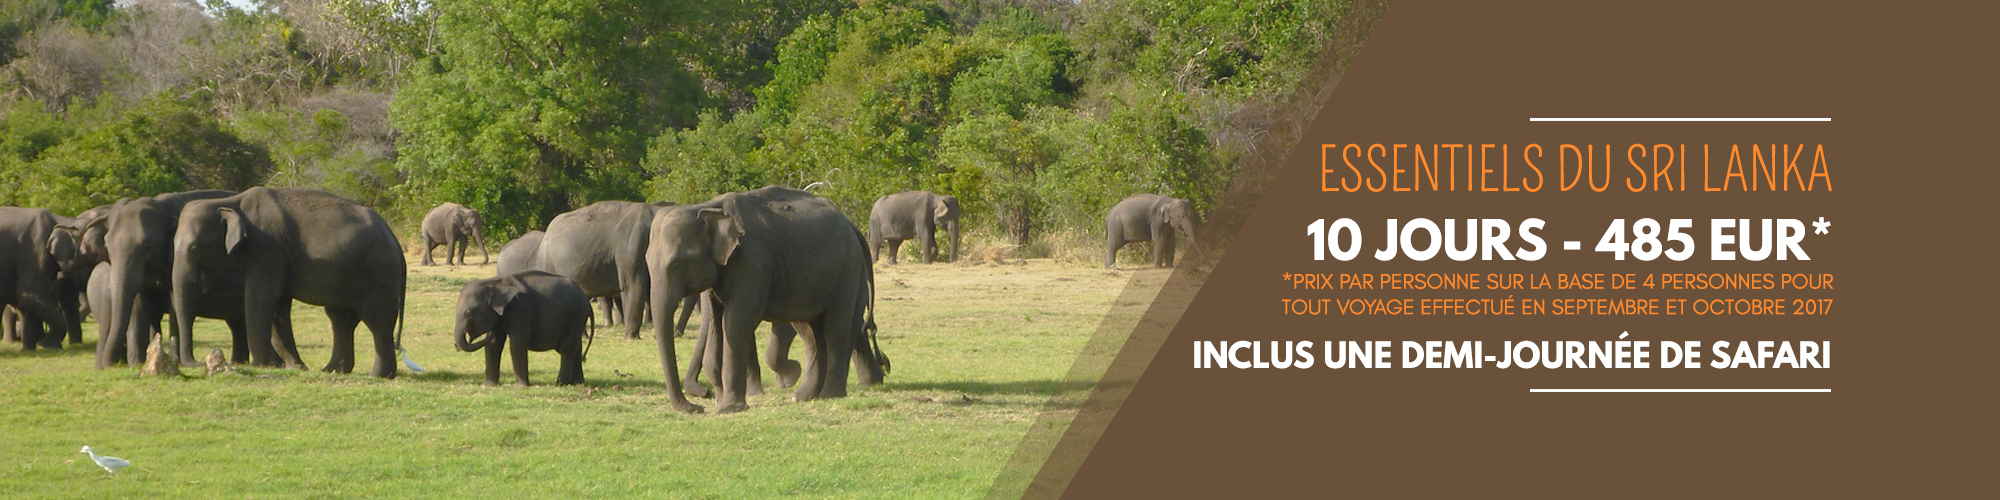 Bons plans voyage au Sri Lanka